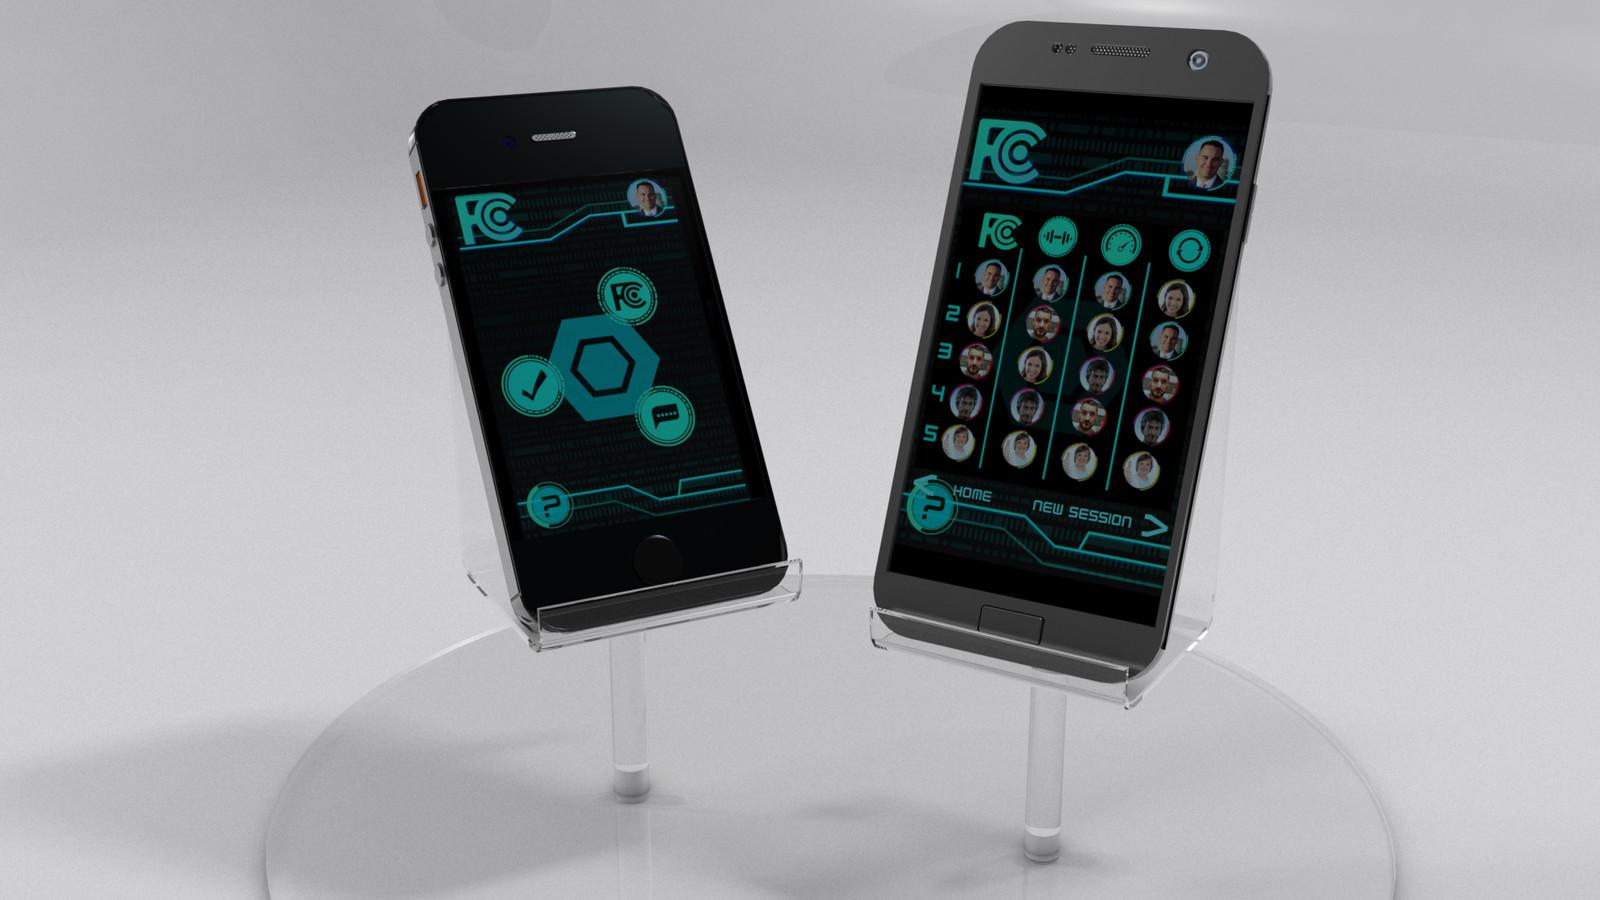 Phone Display for app presentation